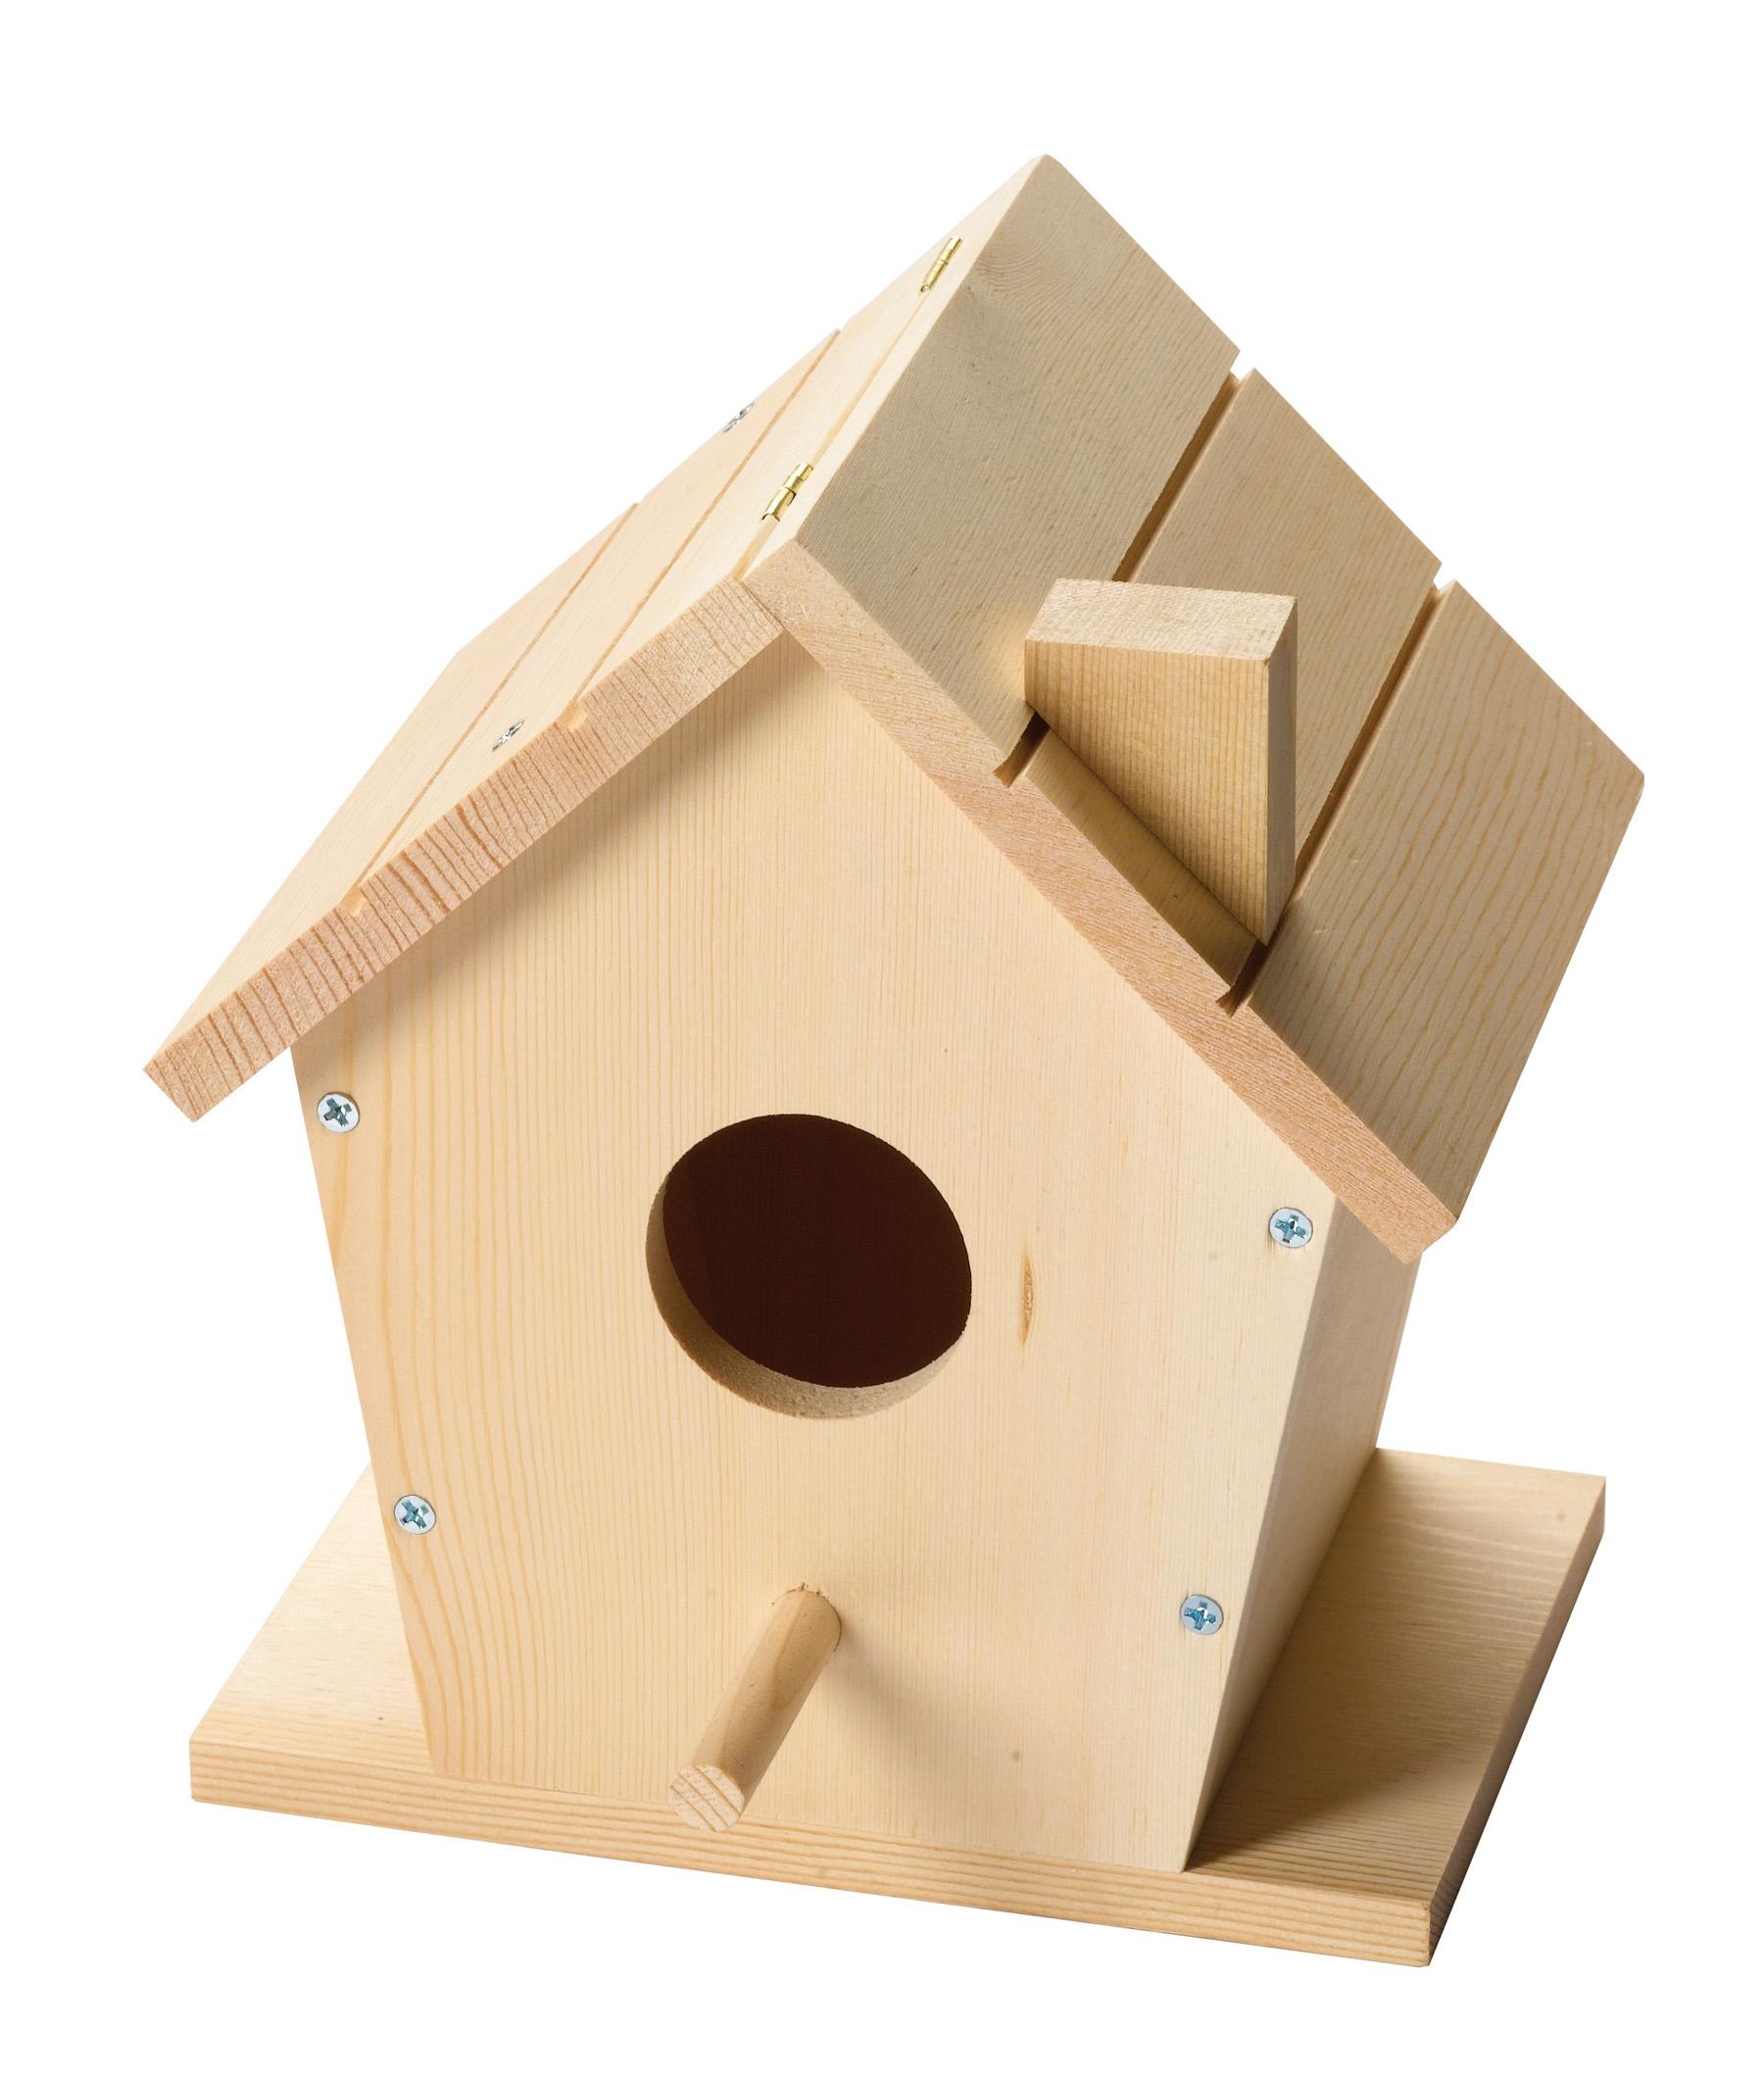 Bird house kit for Birdhouse project